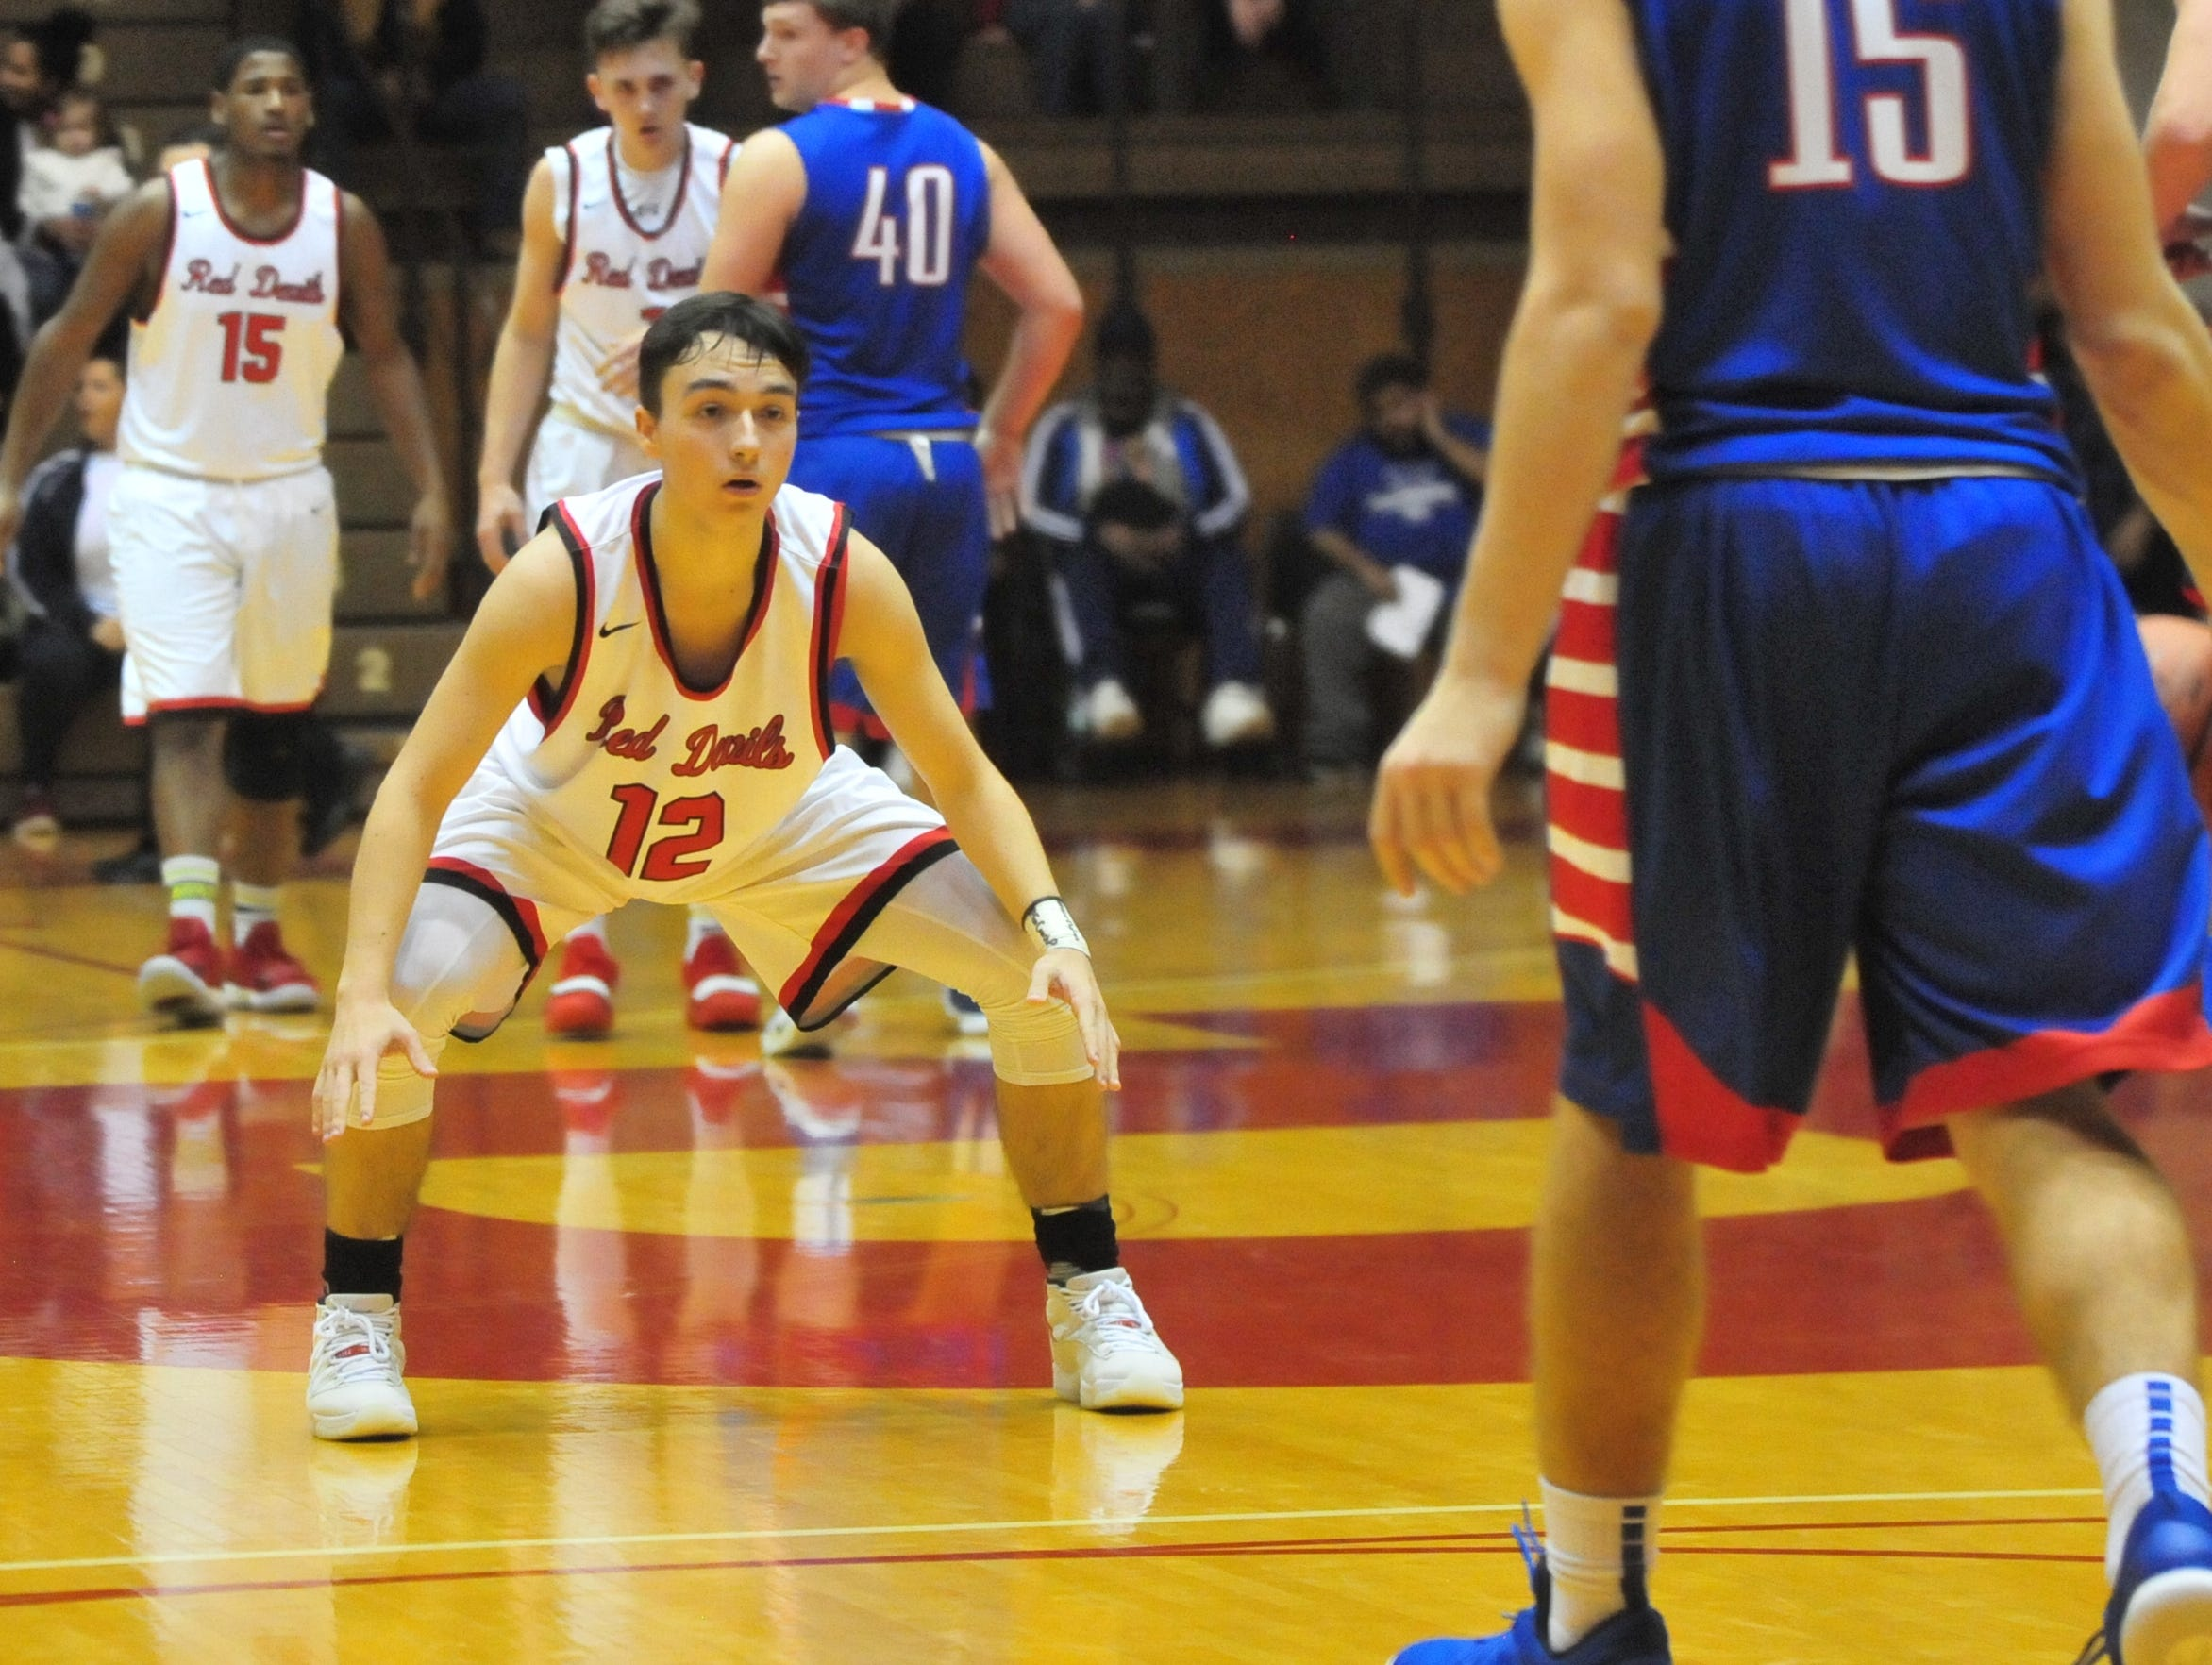 Richmond High School senior Jalen Hillard (12) plays defense during a boys basketball game against Jay County Saturday, Nov. 24, 2018 at Richmond High School's Tiernan Center.